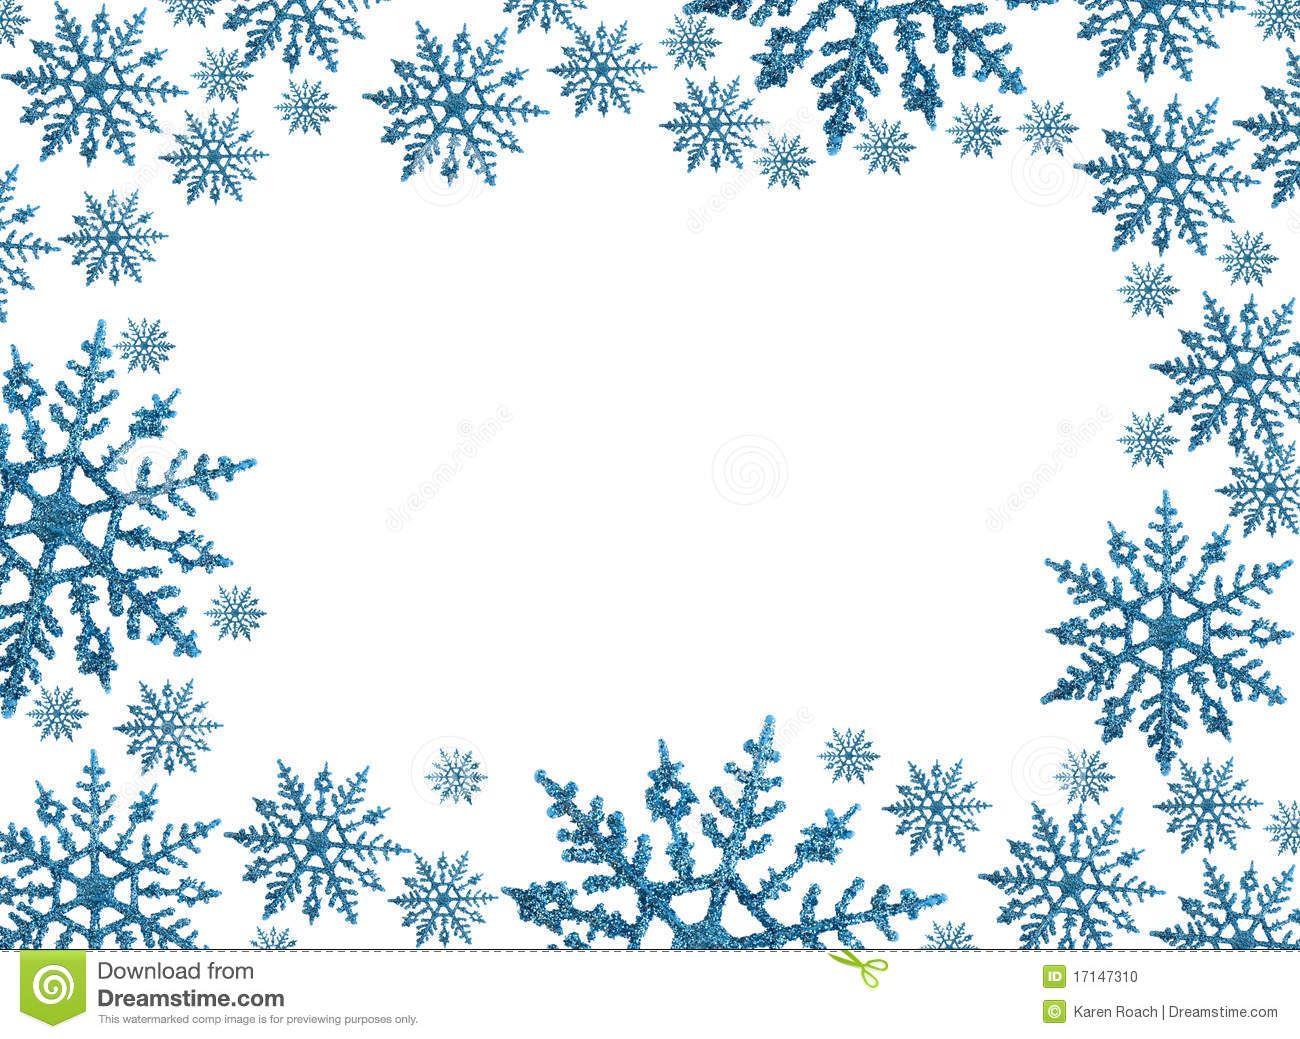 vector library download Snowflake borders clipart. Circle border clip art.